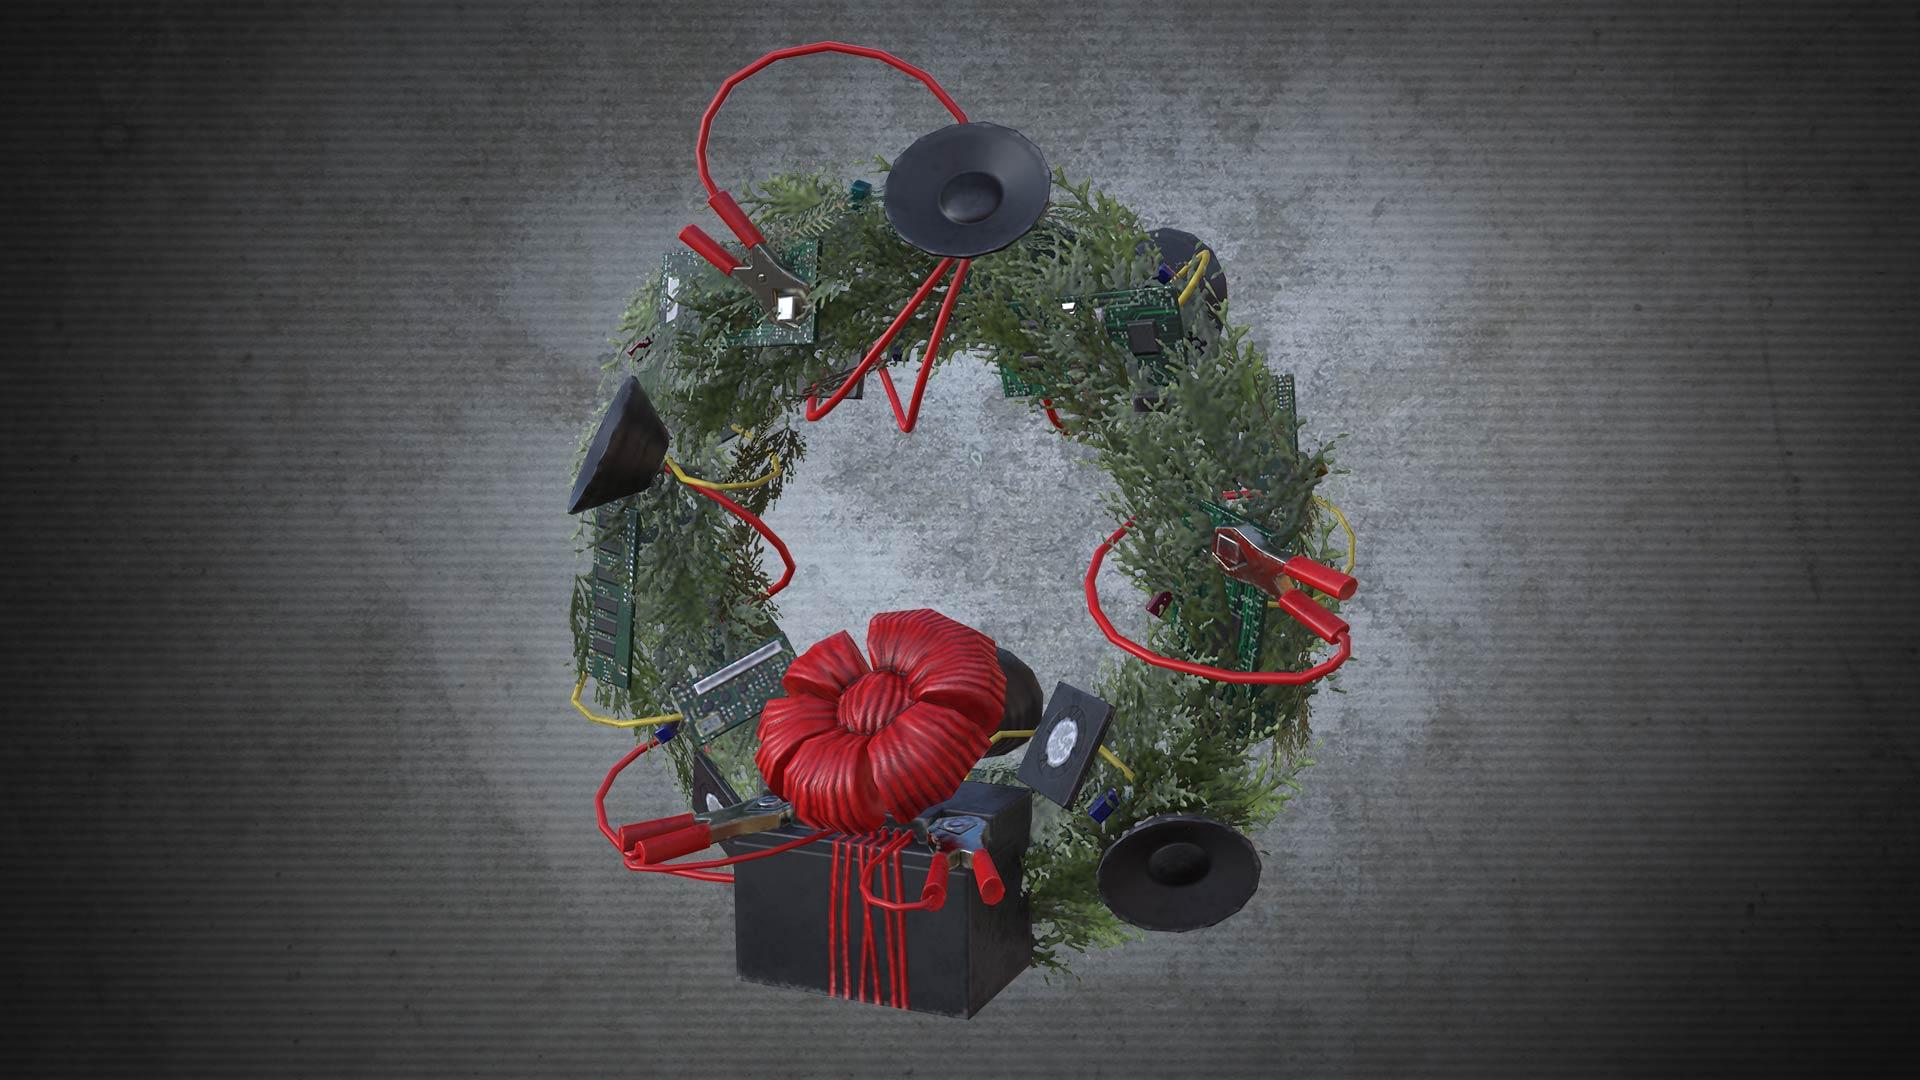 Electric Wreath